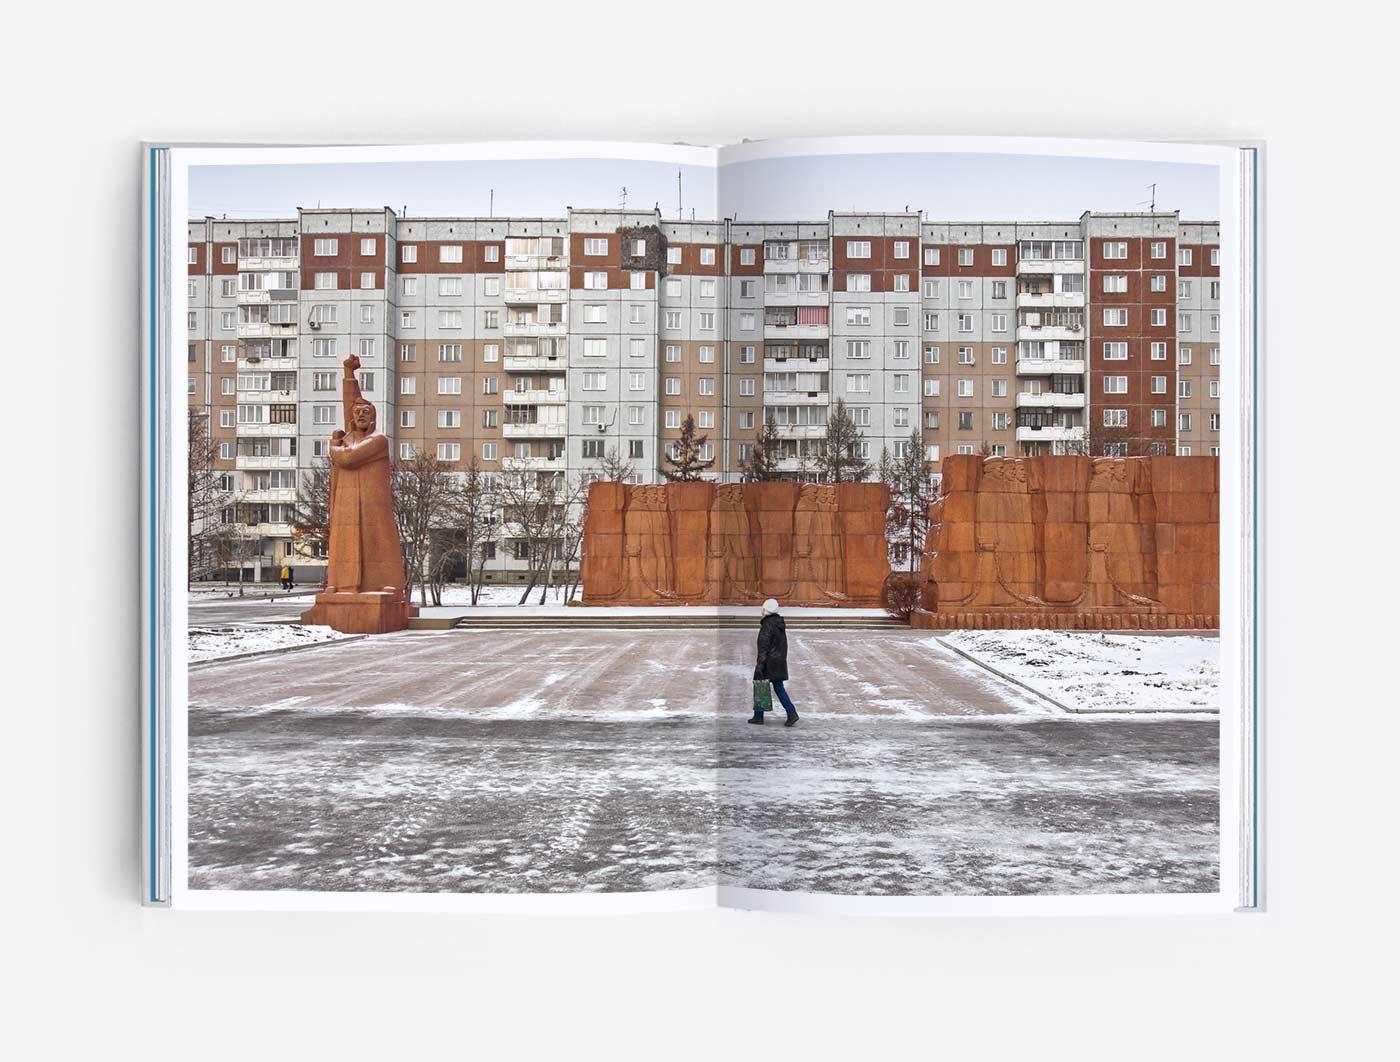 "Political prisioners monunment ""Siberian Convict Way"" in Krasnoyarsk, Siberia"